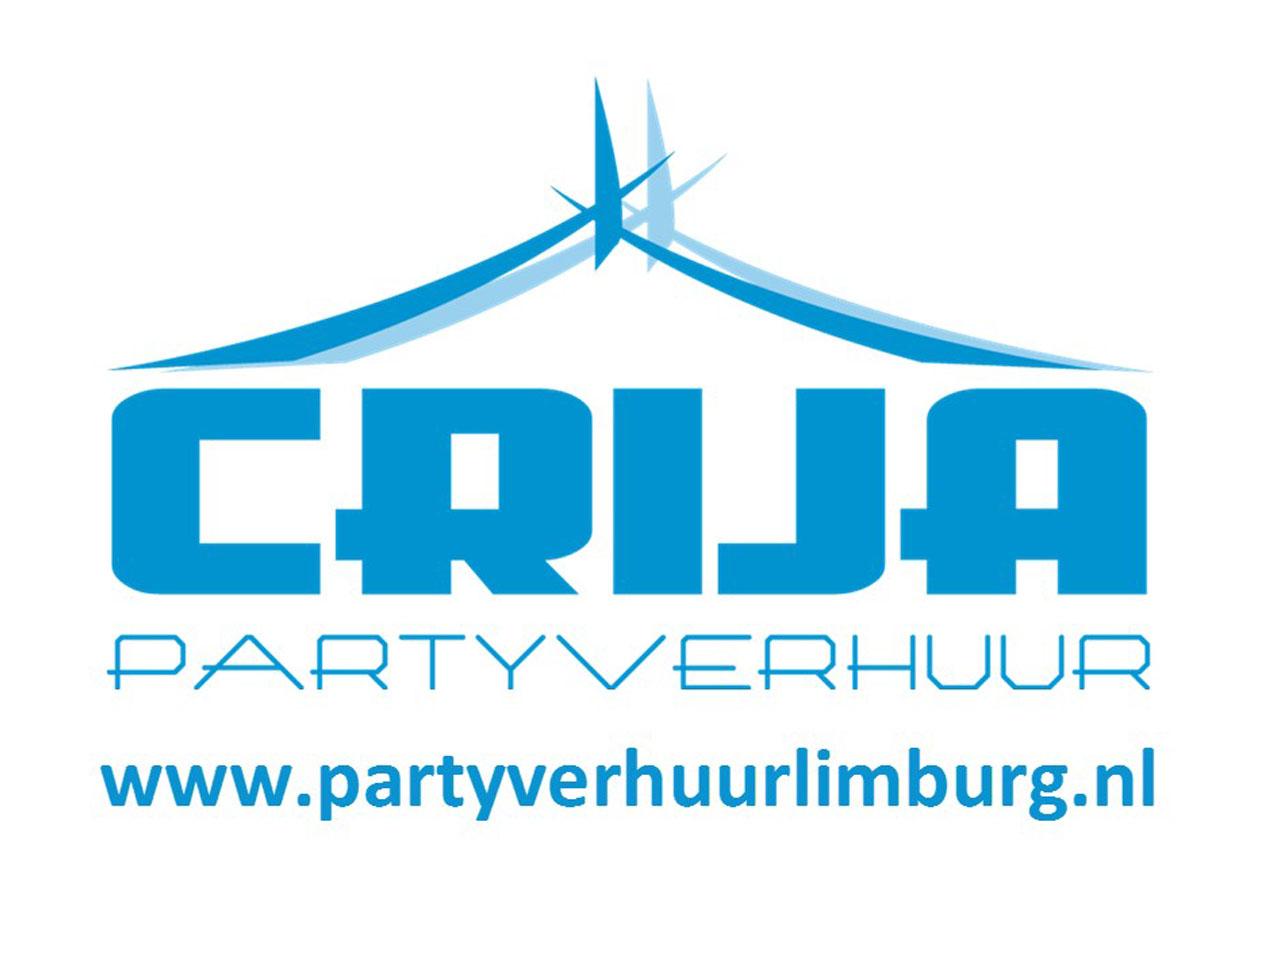 Crija Partyverhuur